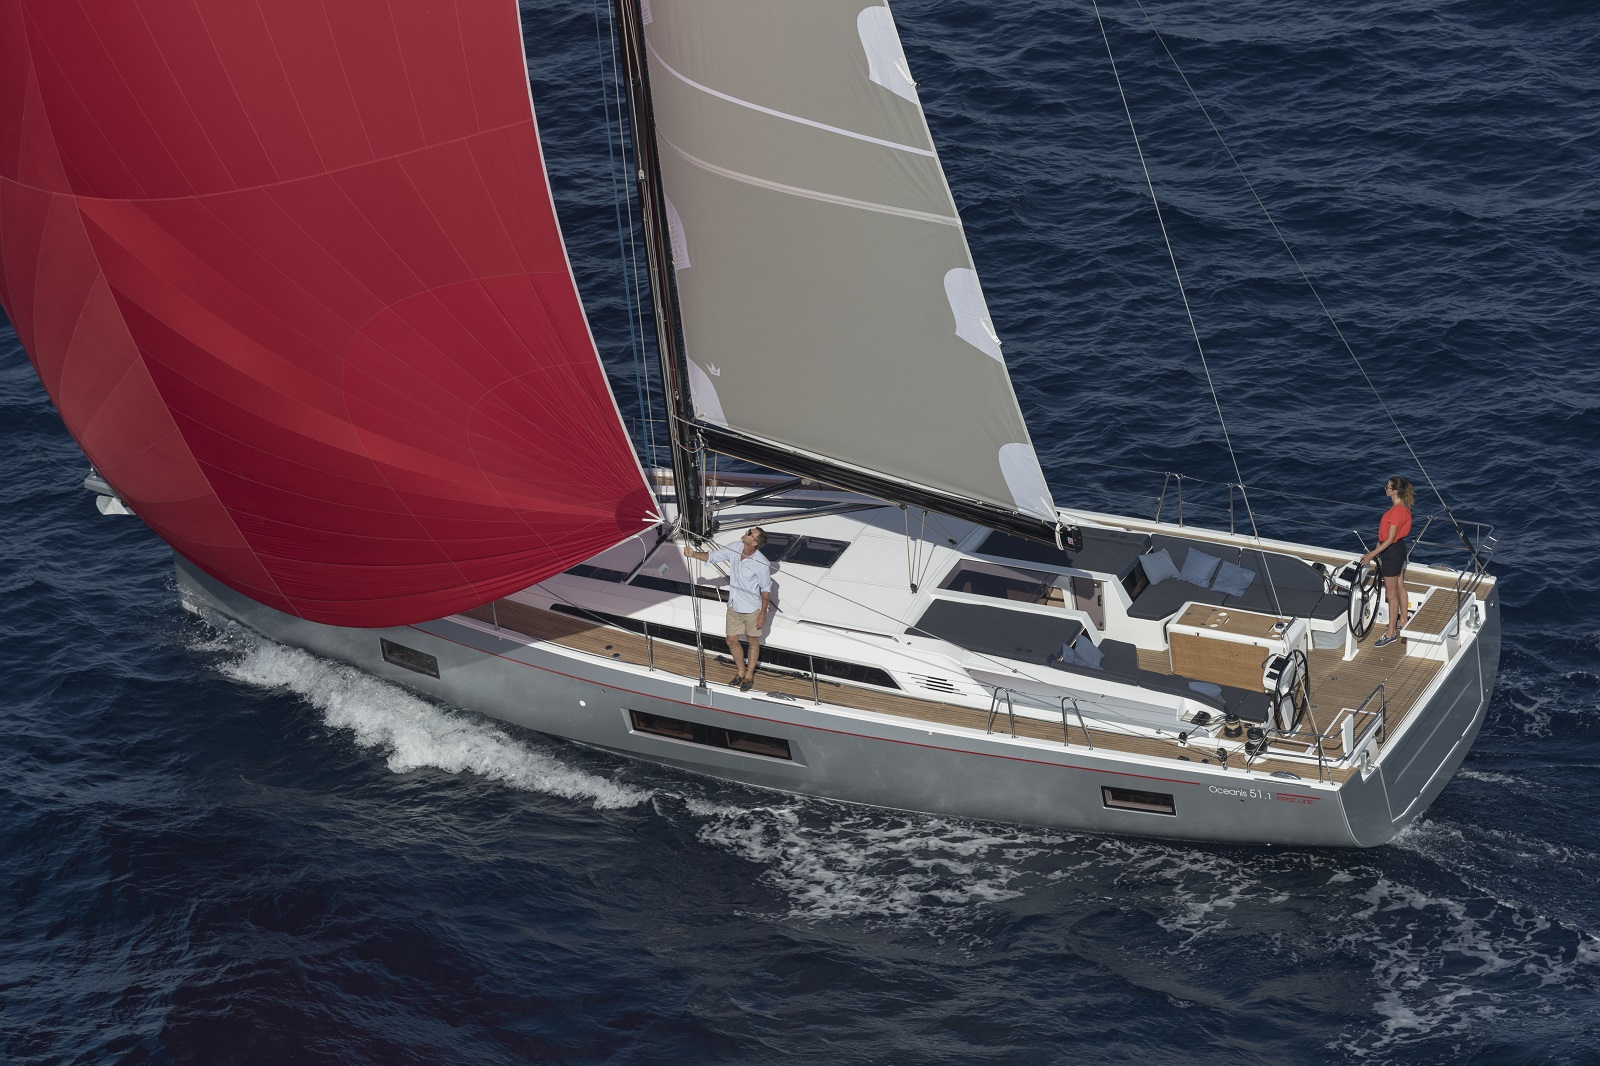 Oceanis 51.1 sailing